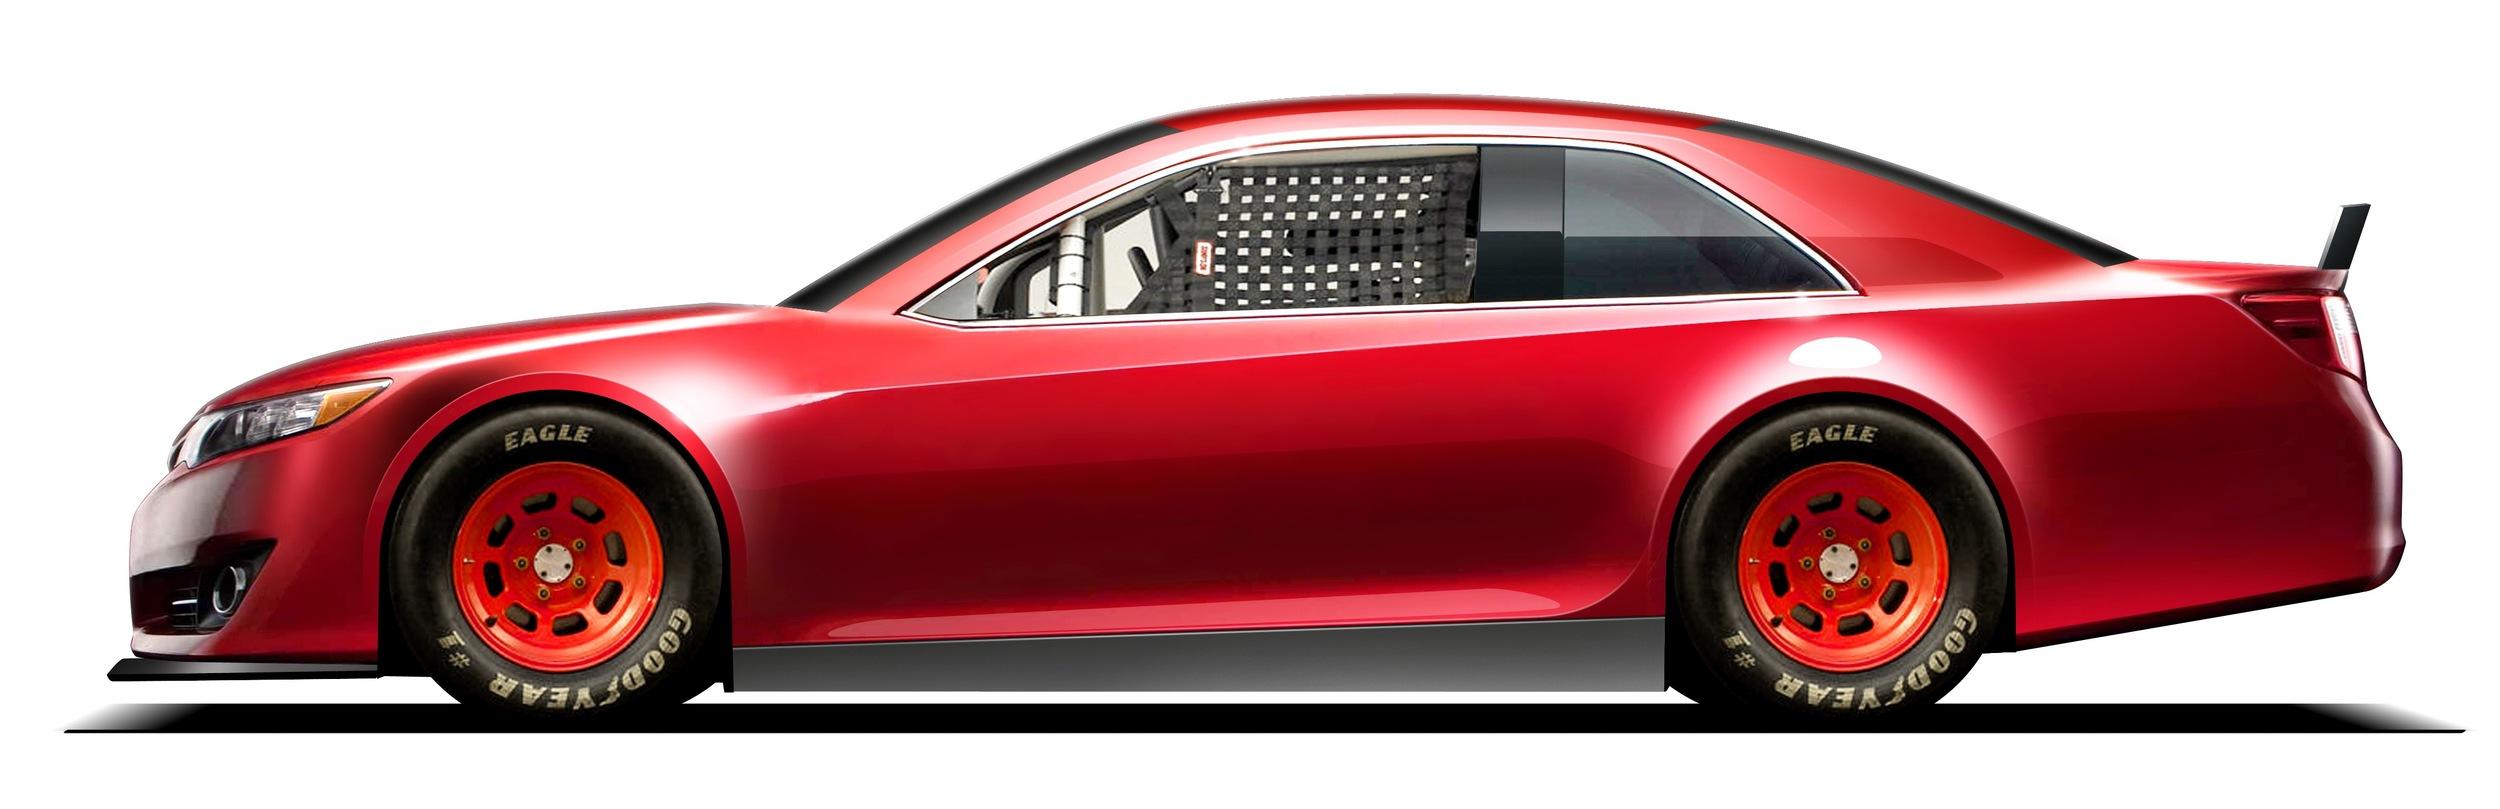 Nascar Cup Car Design Rendering